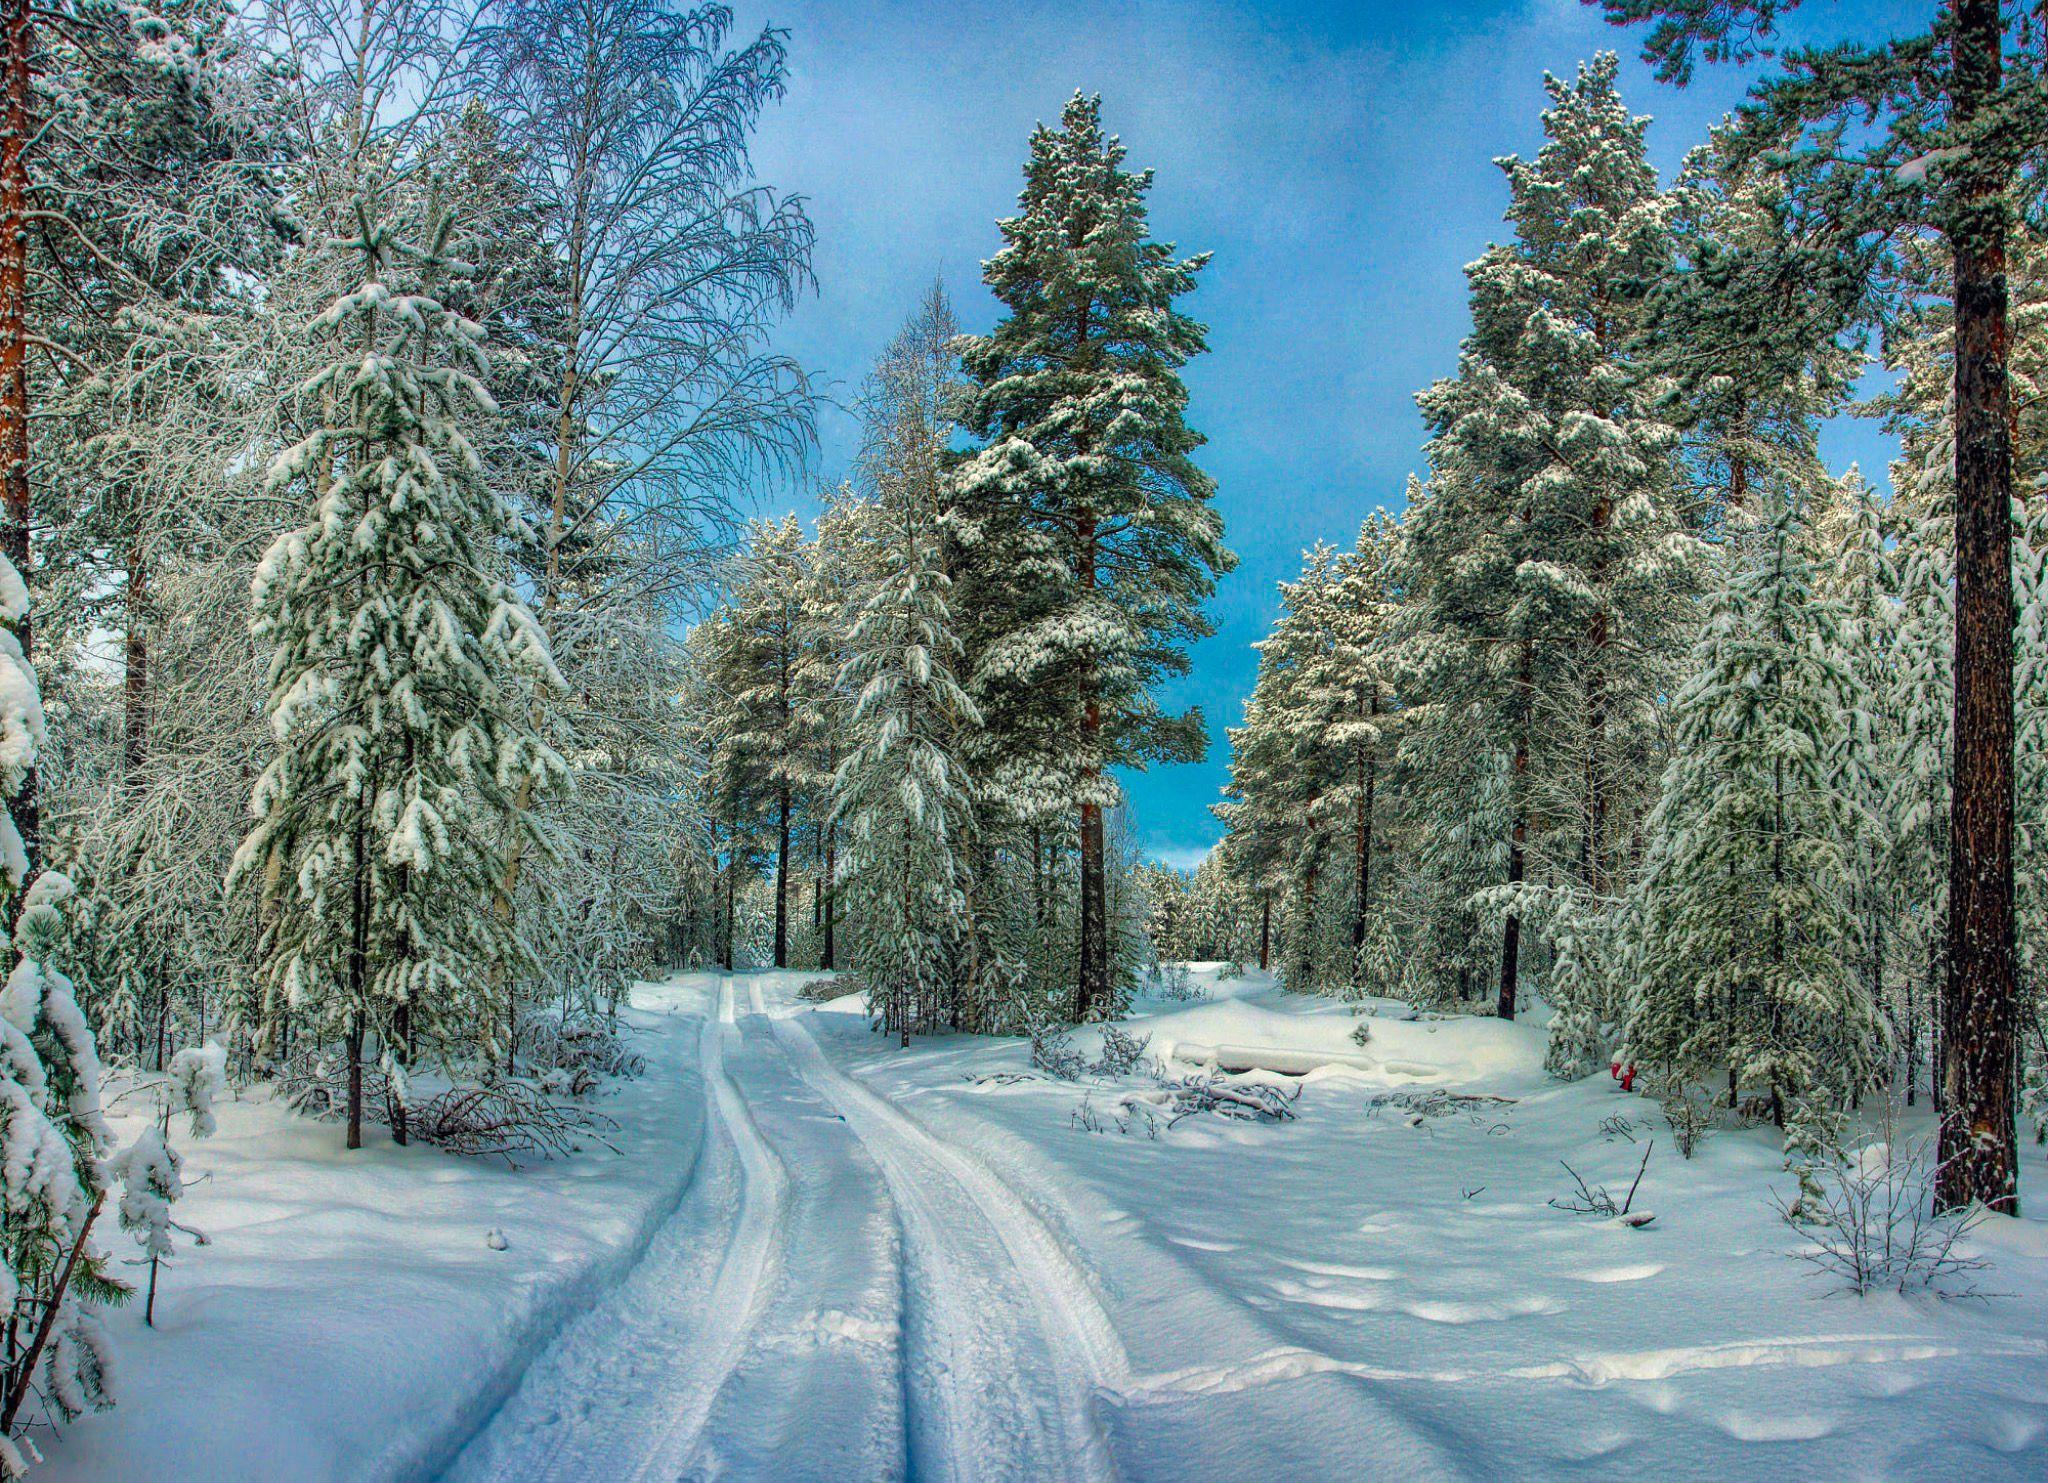 Country lane in winter (Russia) by Tatiana Borisova on ...